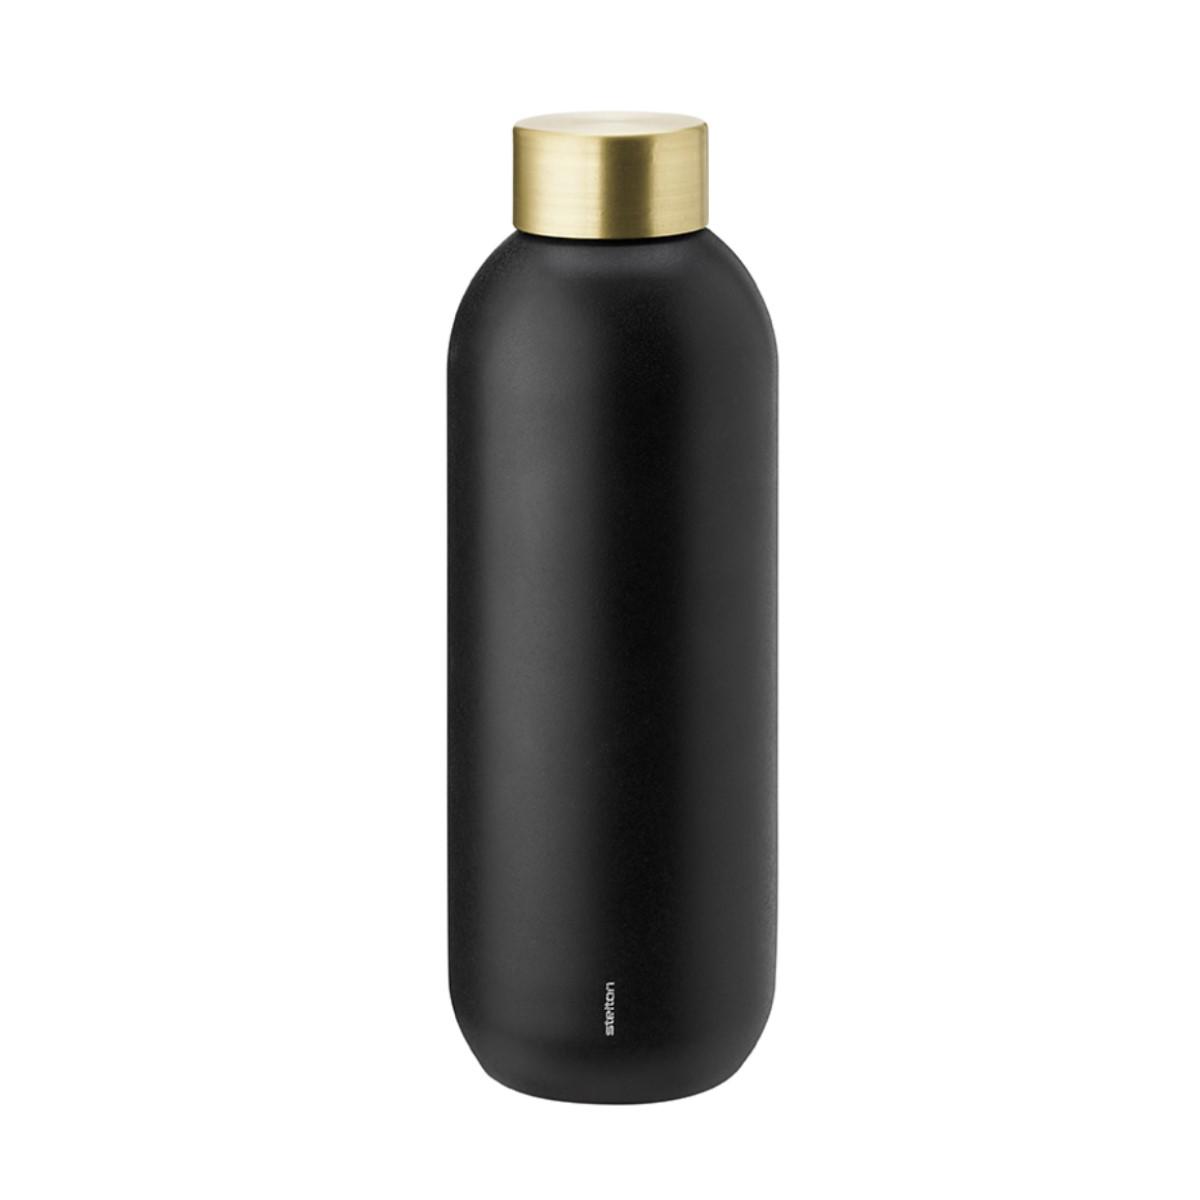 COLLAR_427_Collar_water_bottle_brass_black